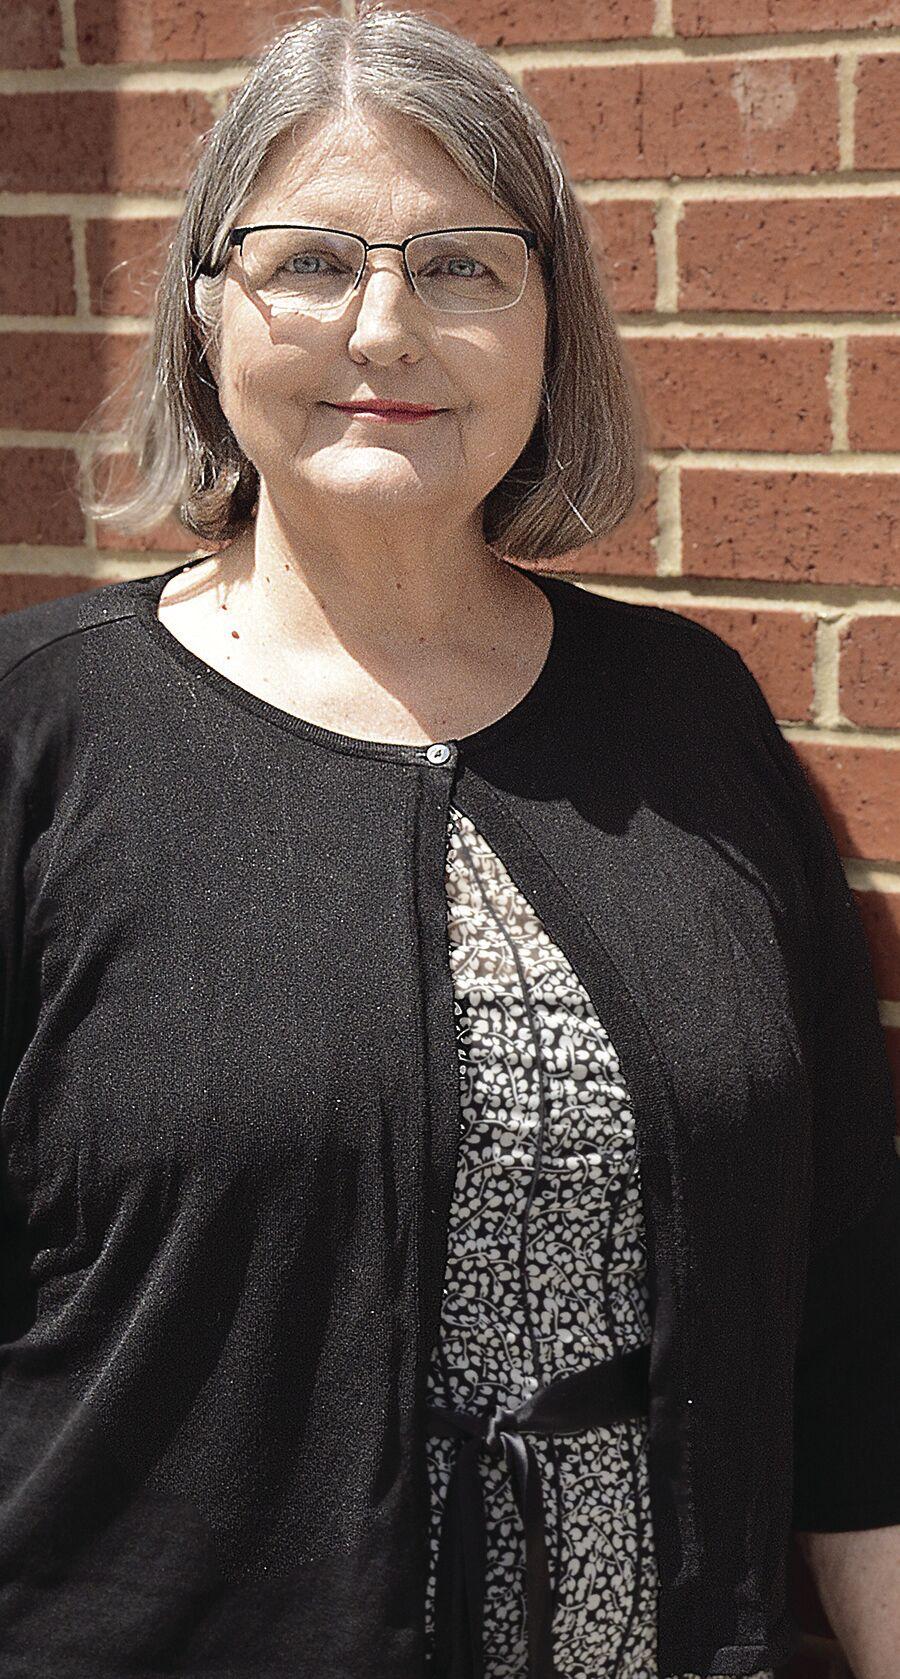 Cathy Rinehart